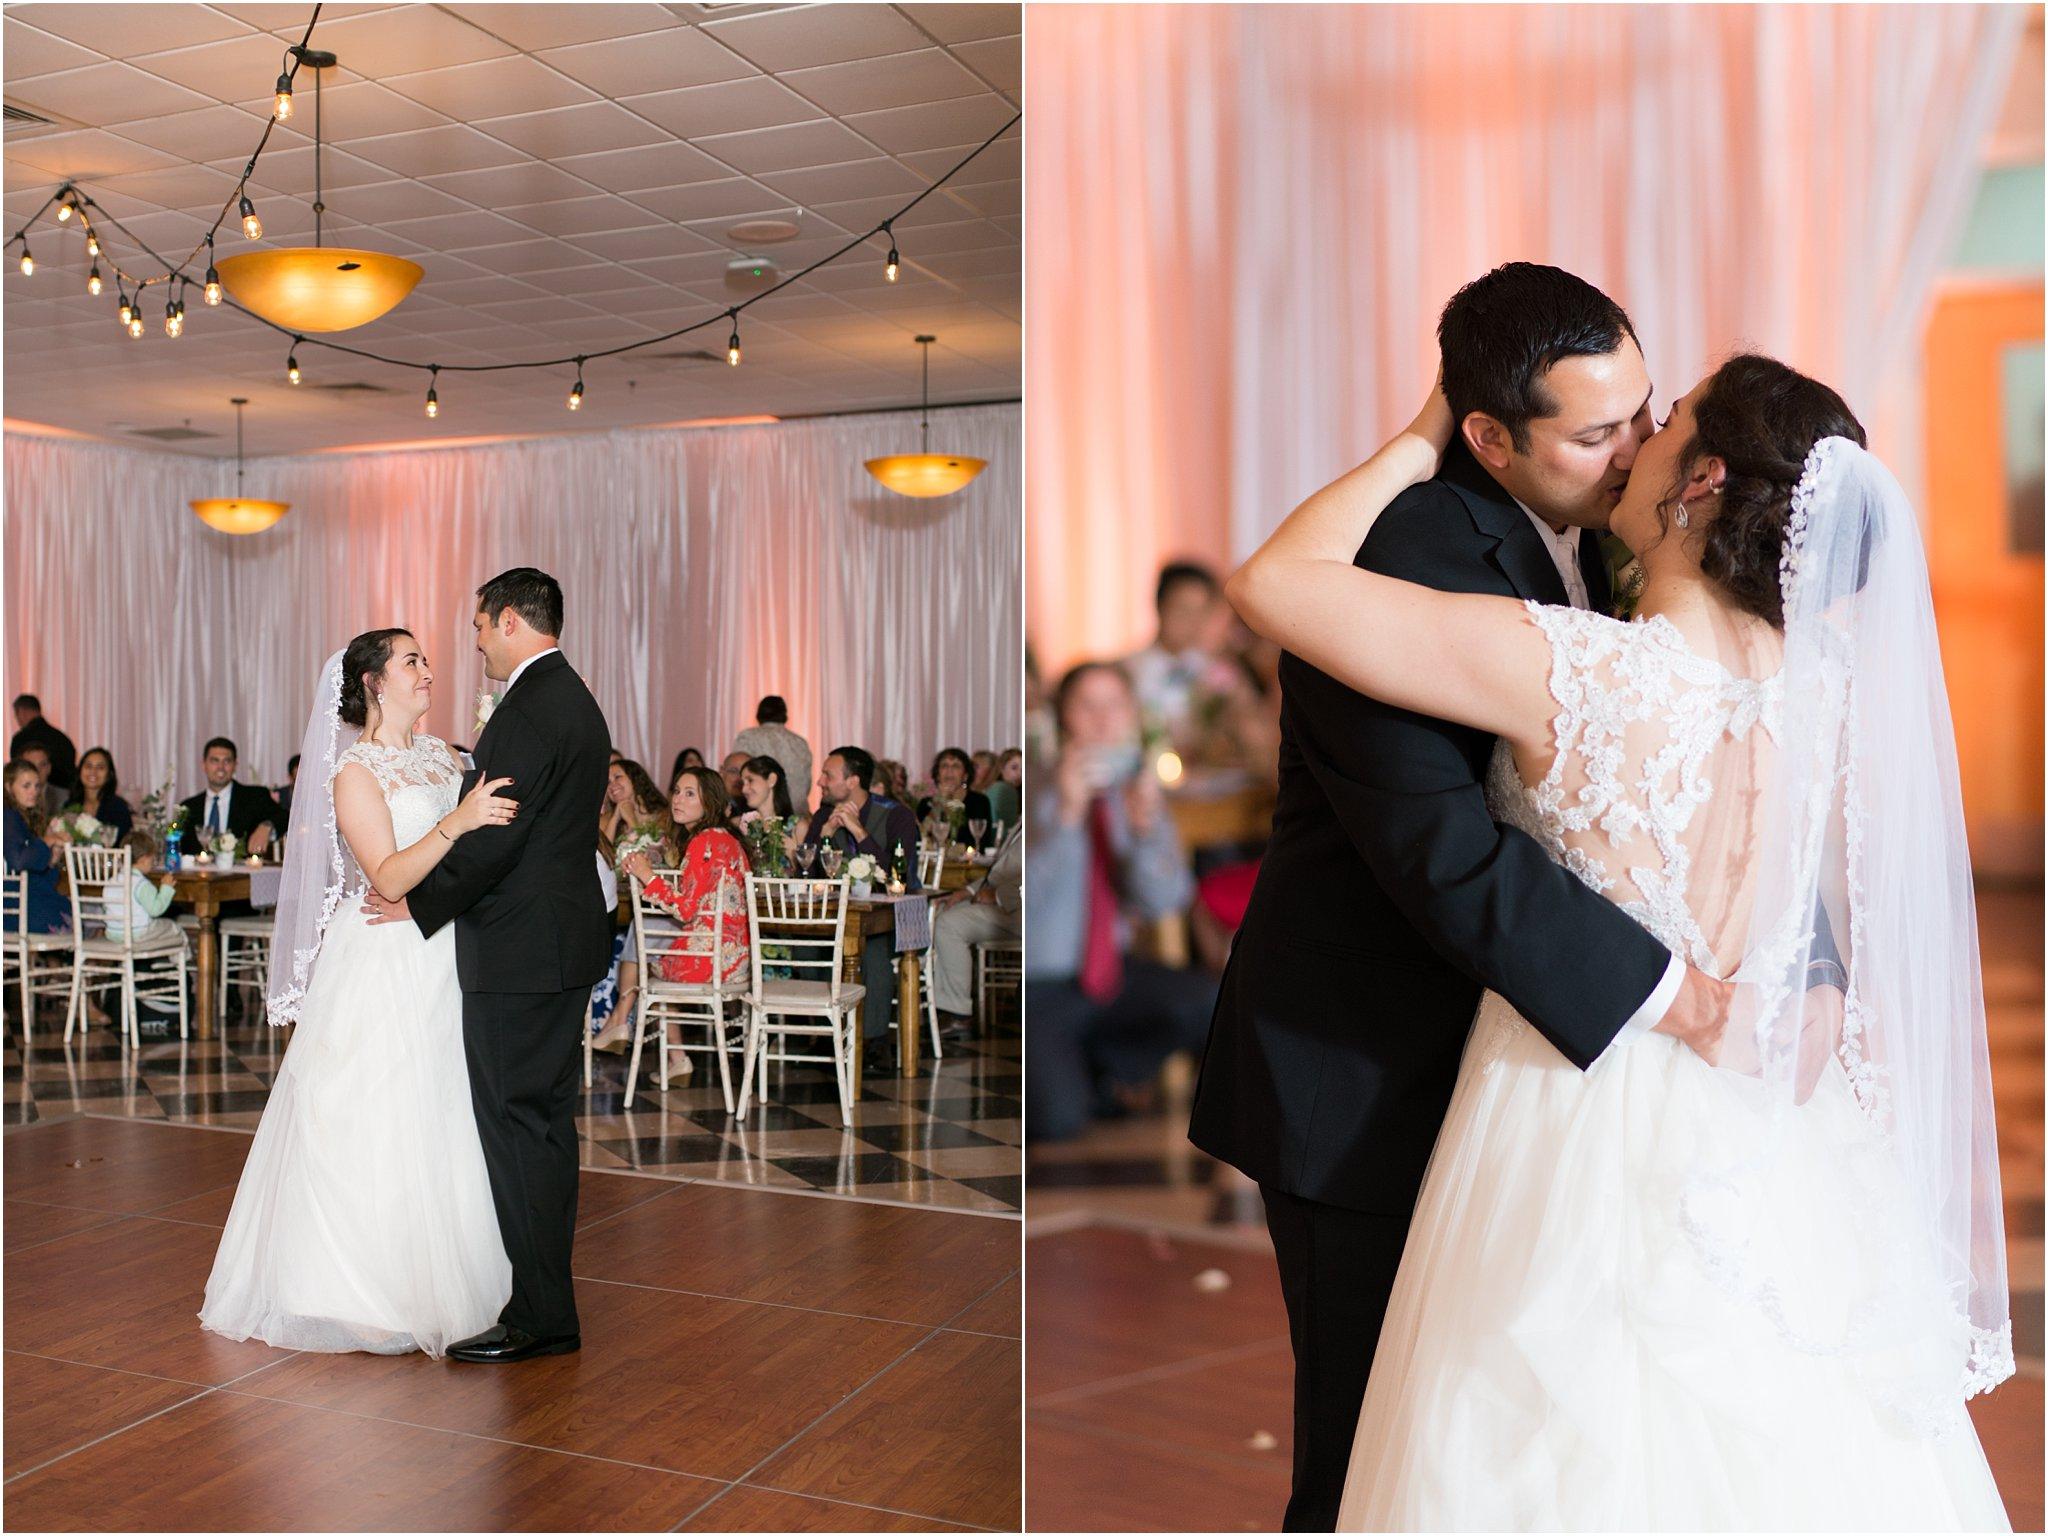 jessica_ryan_photography_virginia_wedding_photographer_wedding_hurricane_norfolk_botanical_gardens_hurricane_matthew_wedding_3630